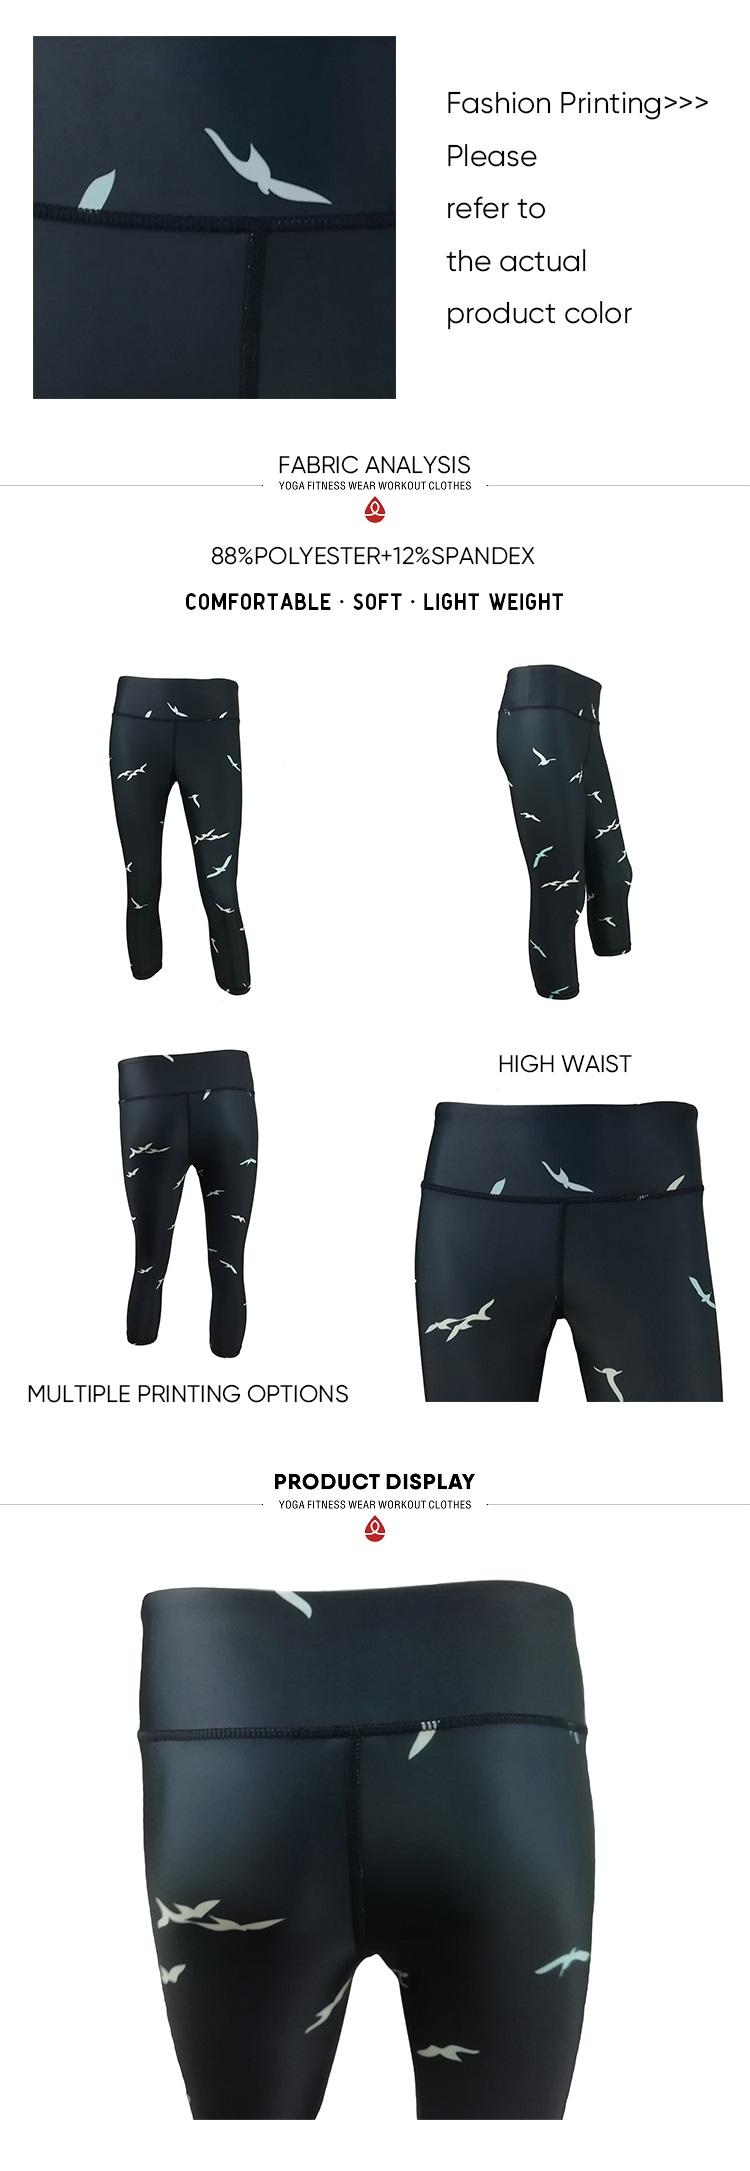 Wholesale women capri pants leggings apparel stock